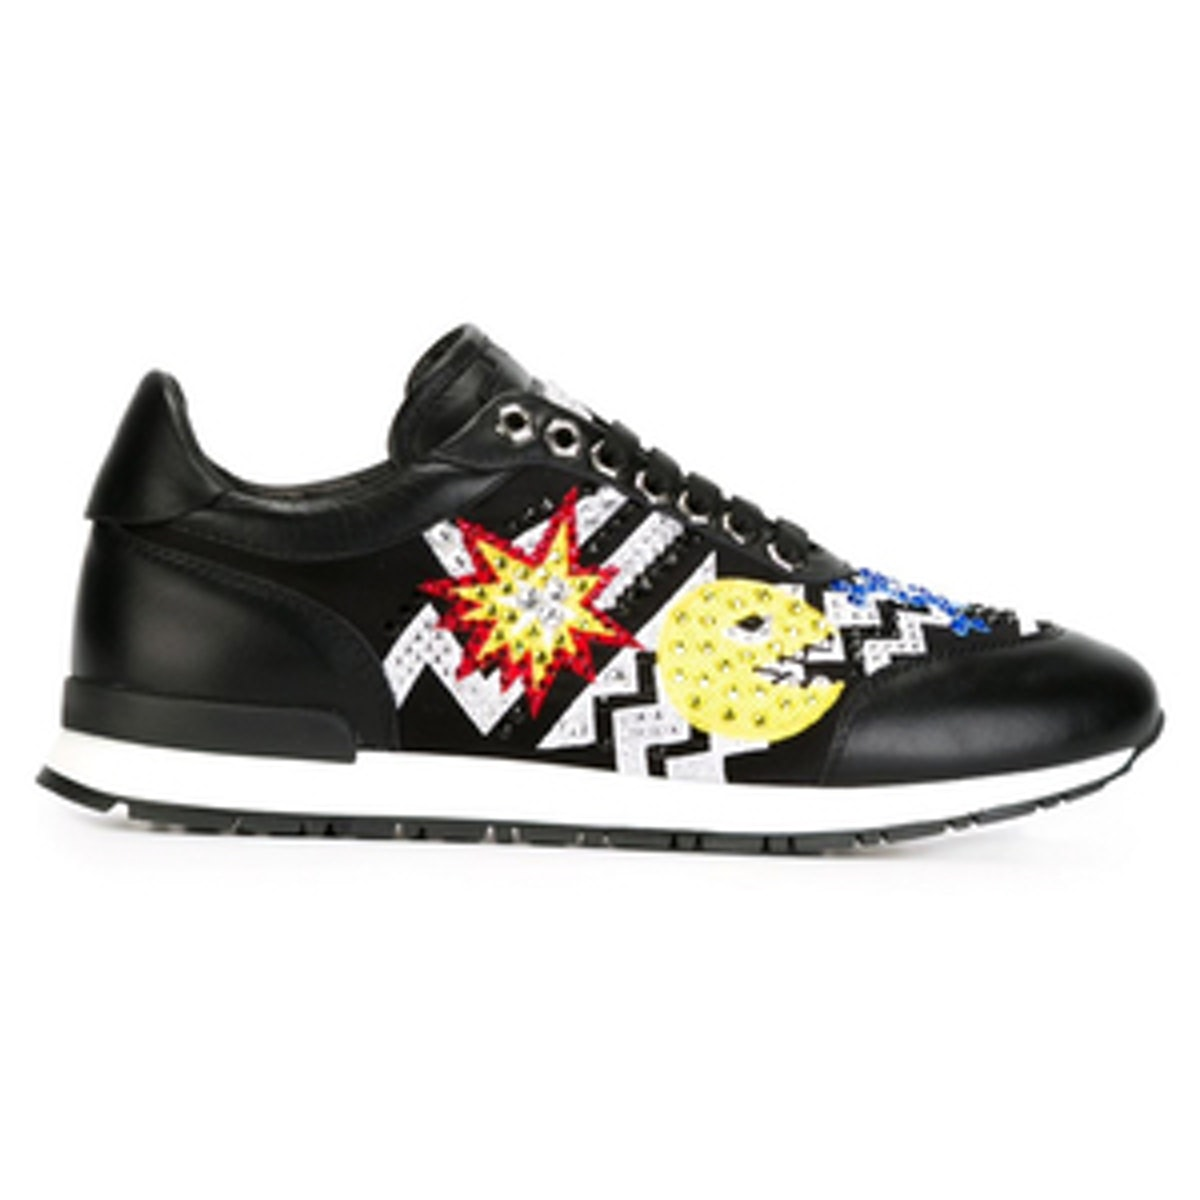 Fantastic Rainbow Sneakers